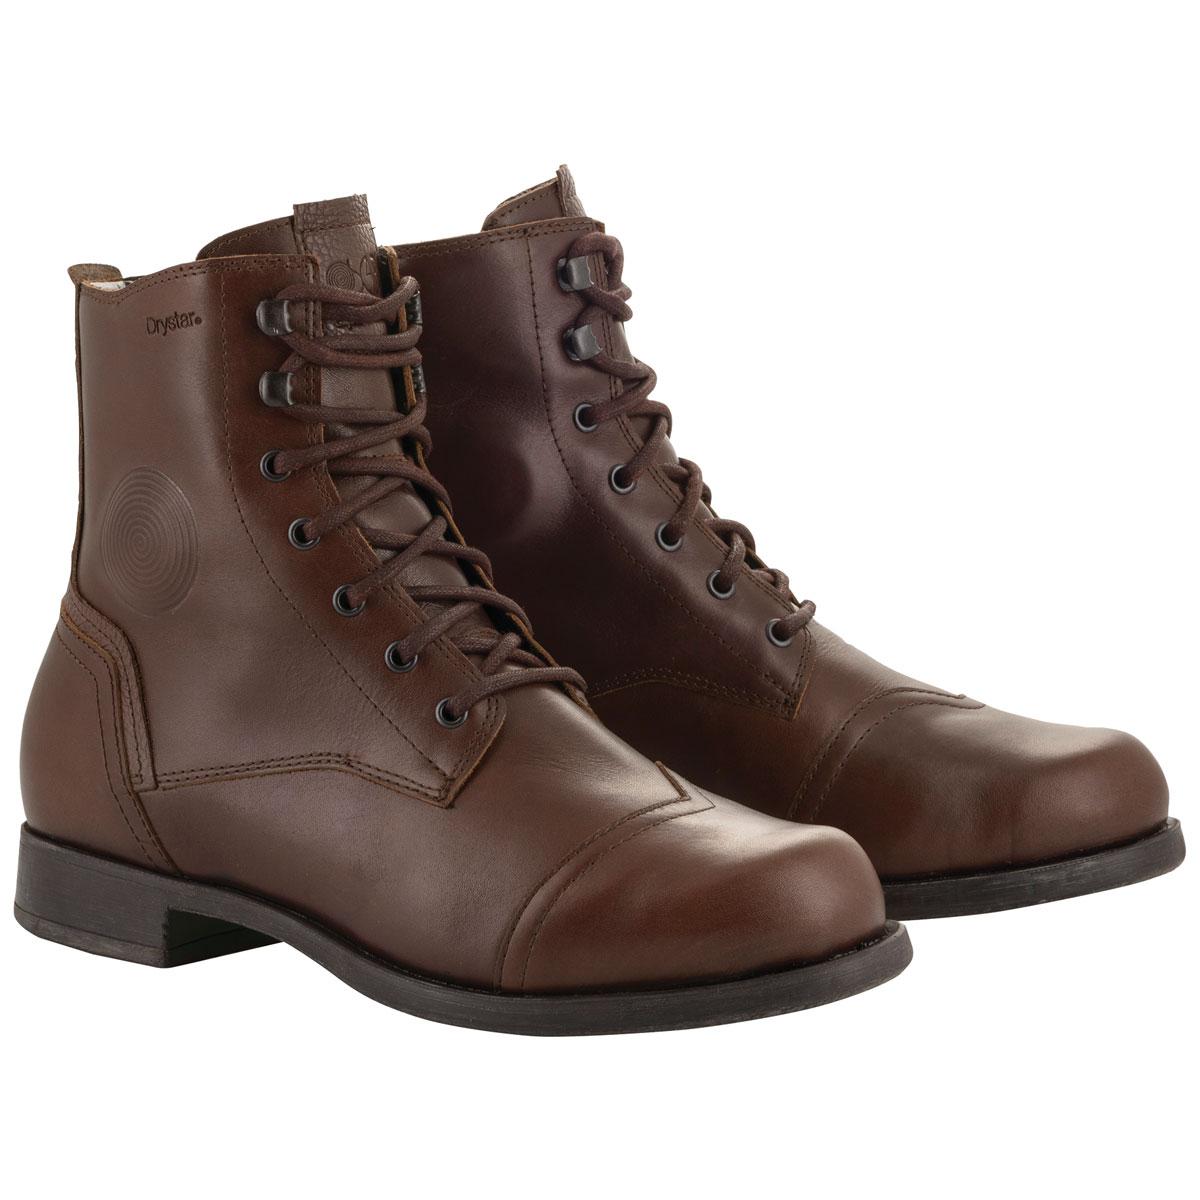 Alpinestars Men's Distinct Drystar Brown Boots